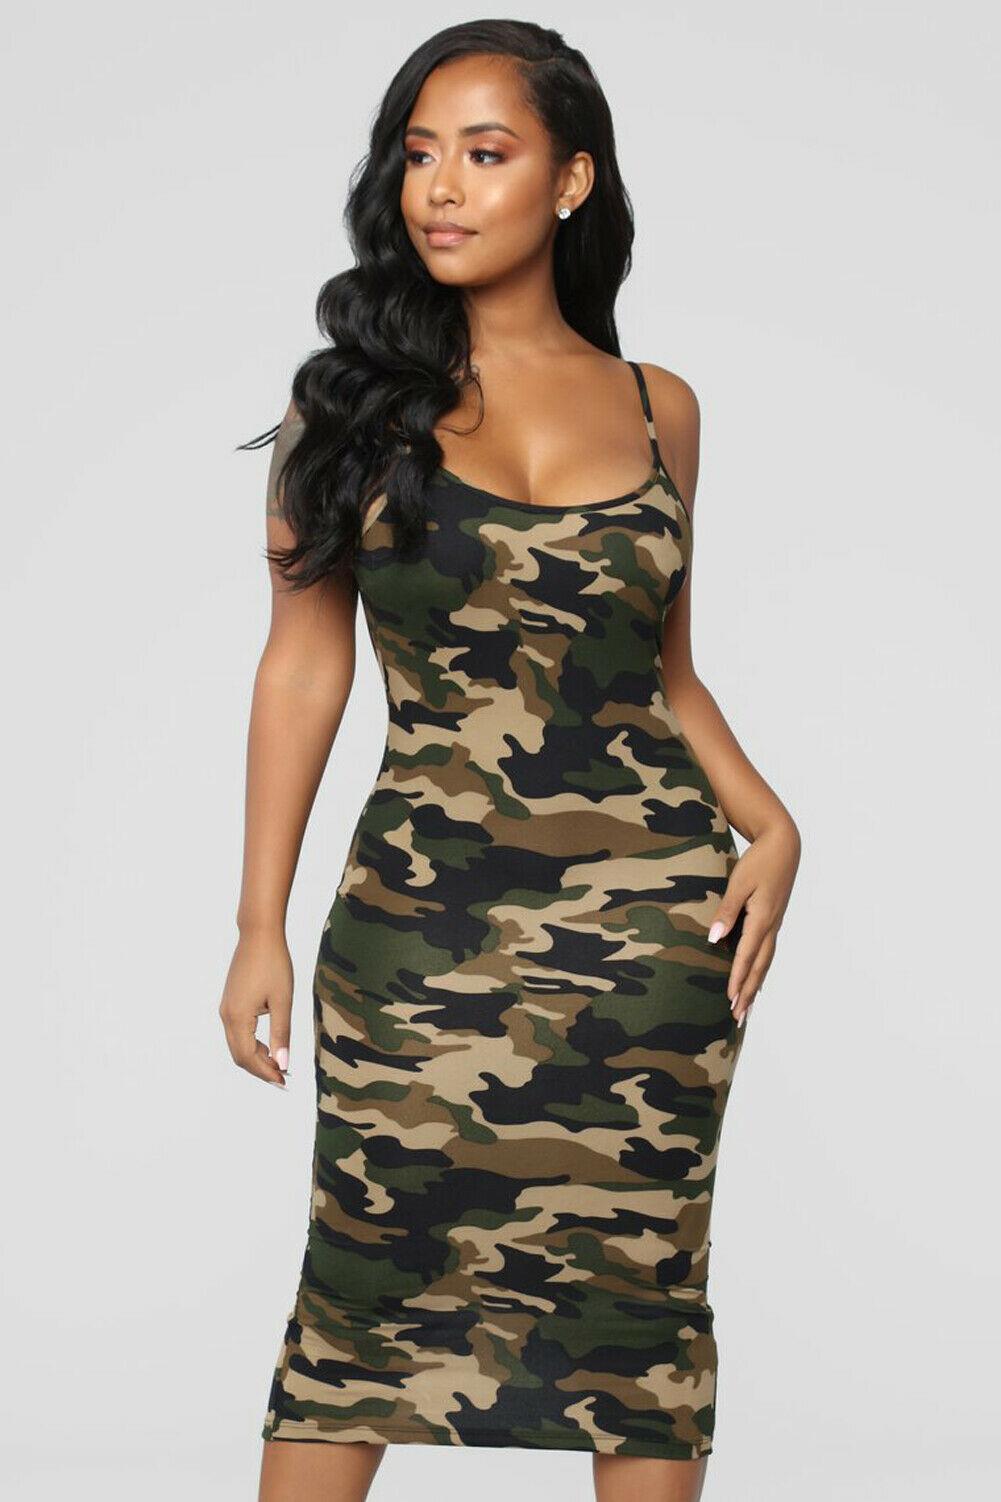 M//L Womens Ladies New Quality Fashion Army//Camouflage Print BODYCON DRESS S//M